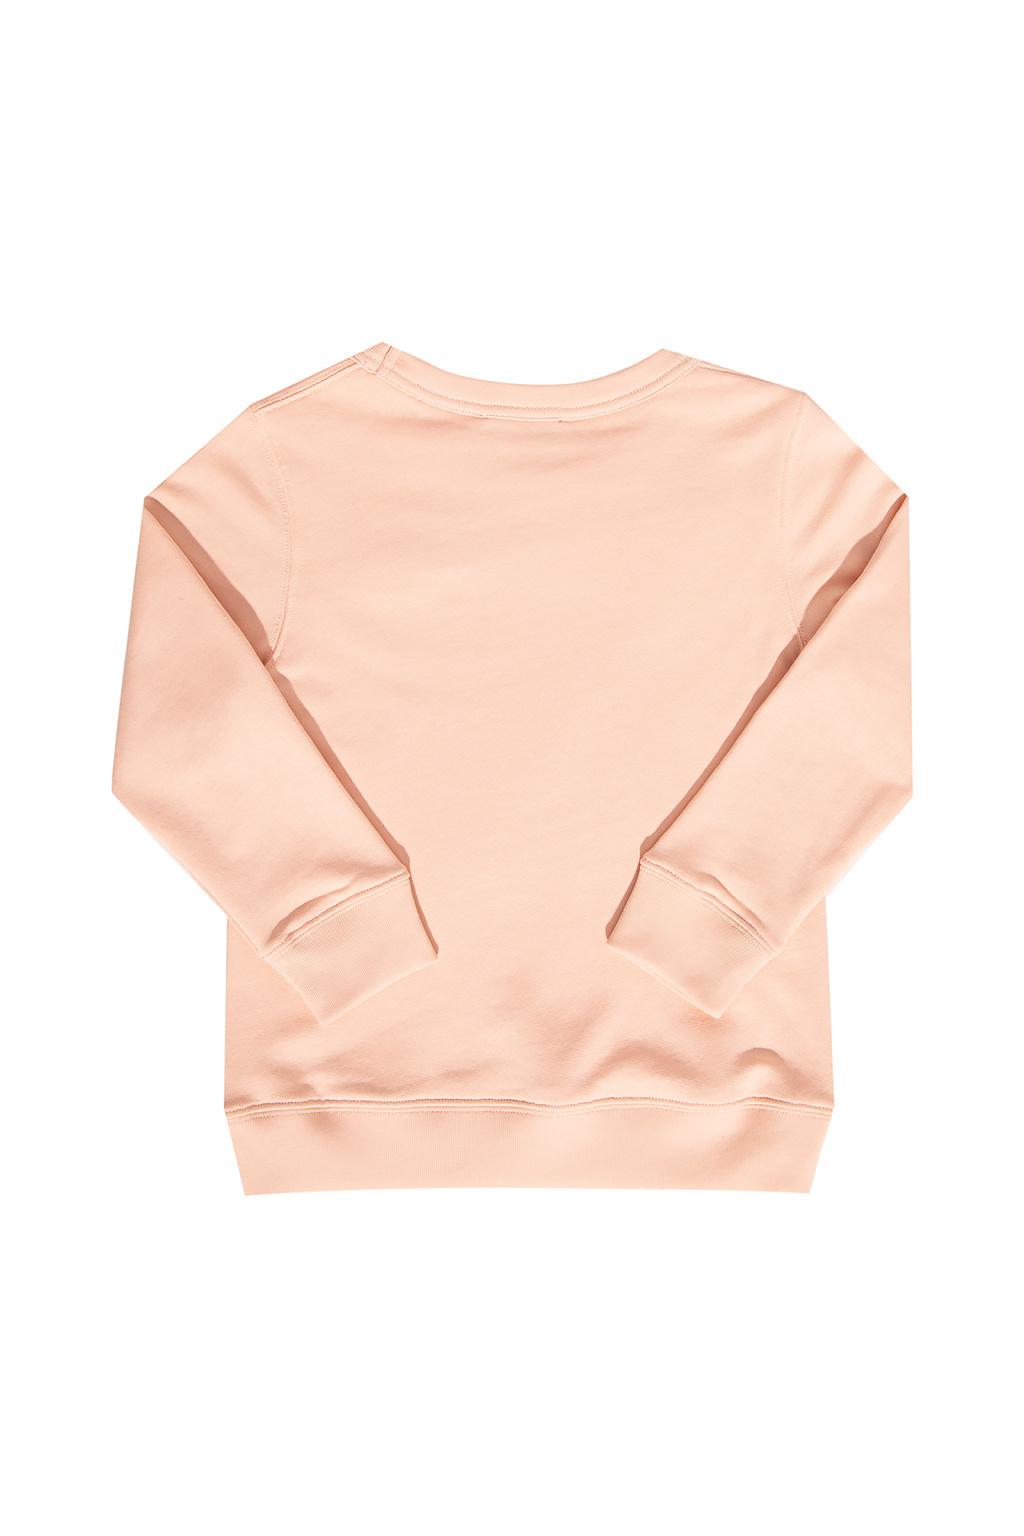 Acne Studios Kids Sweatshirt with logo